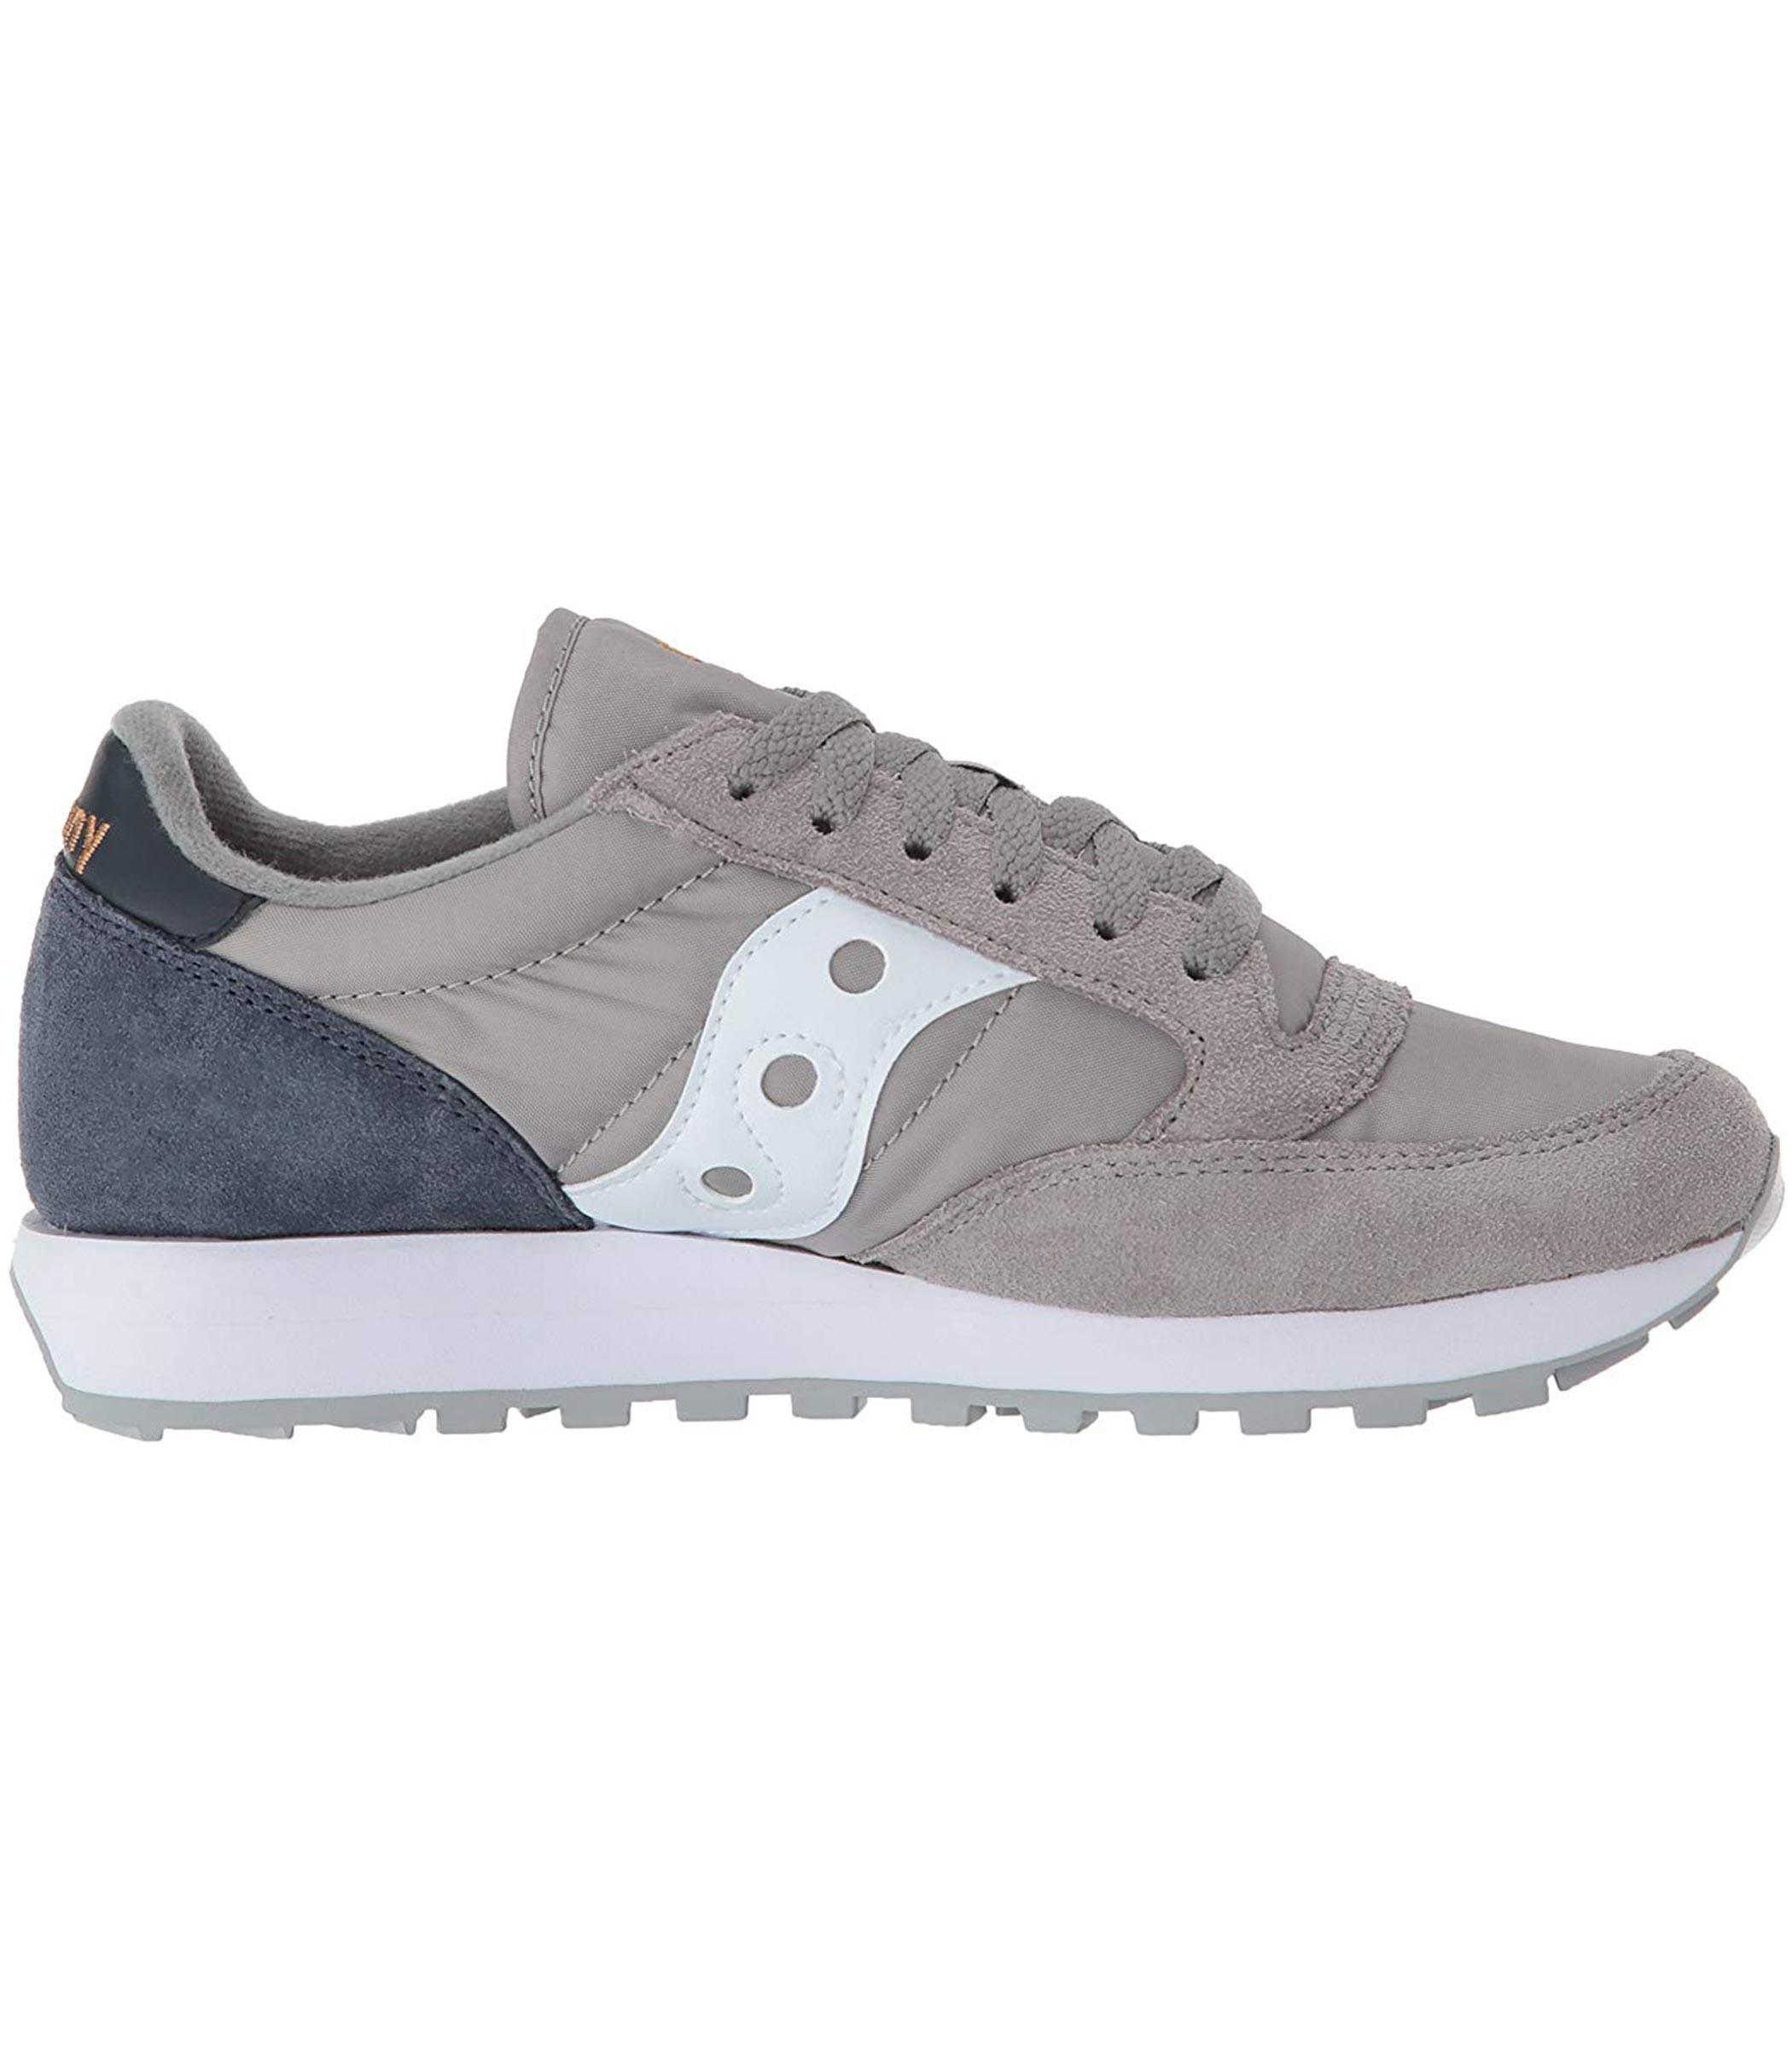 f53d3c118d9199 scarpe-sneakers-saucony-jazz-original-donna-rif-s1044-454.jpg